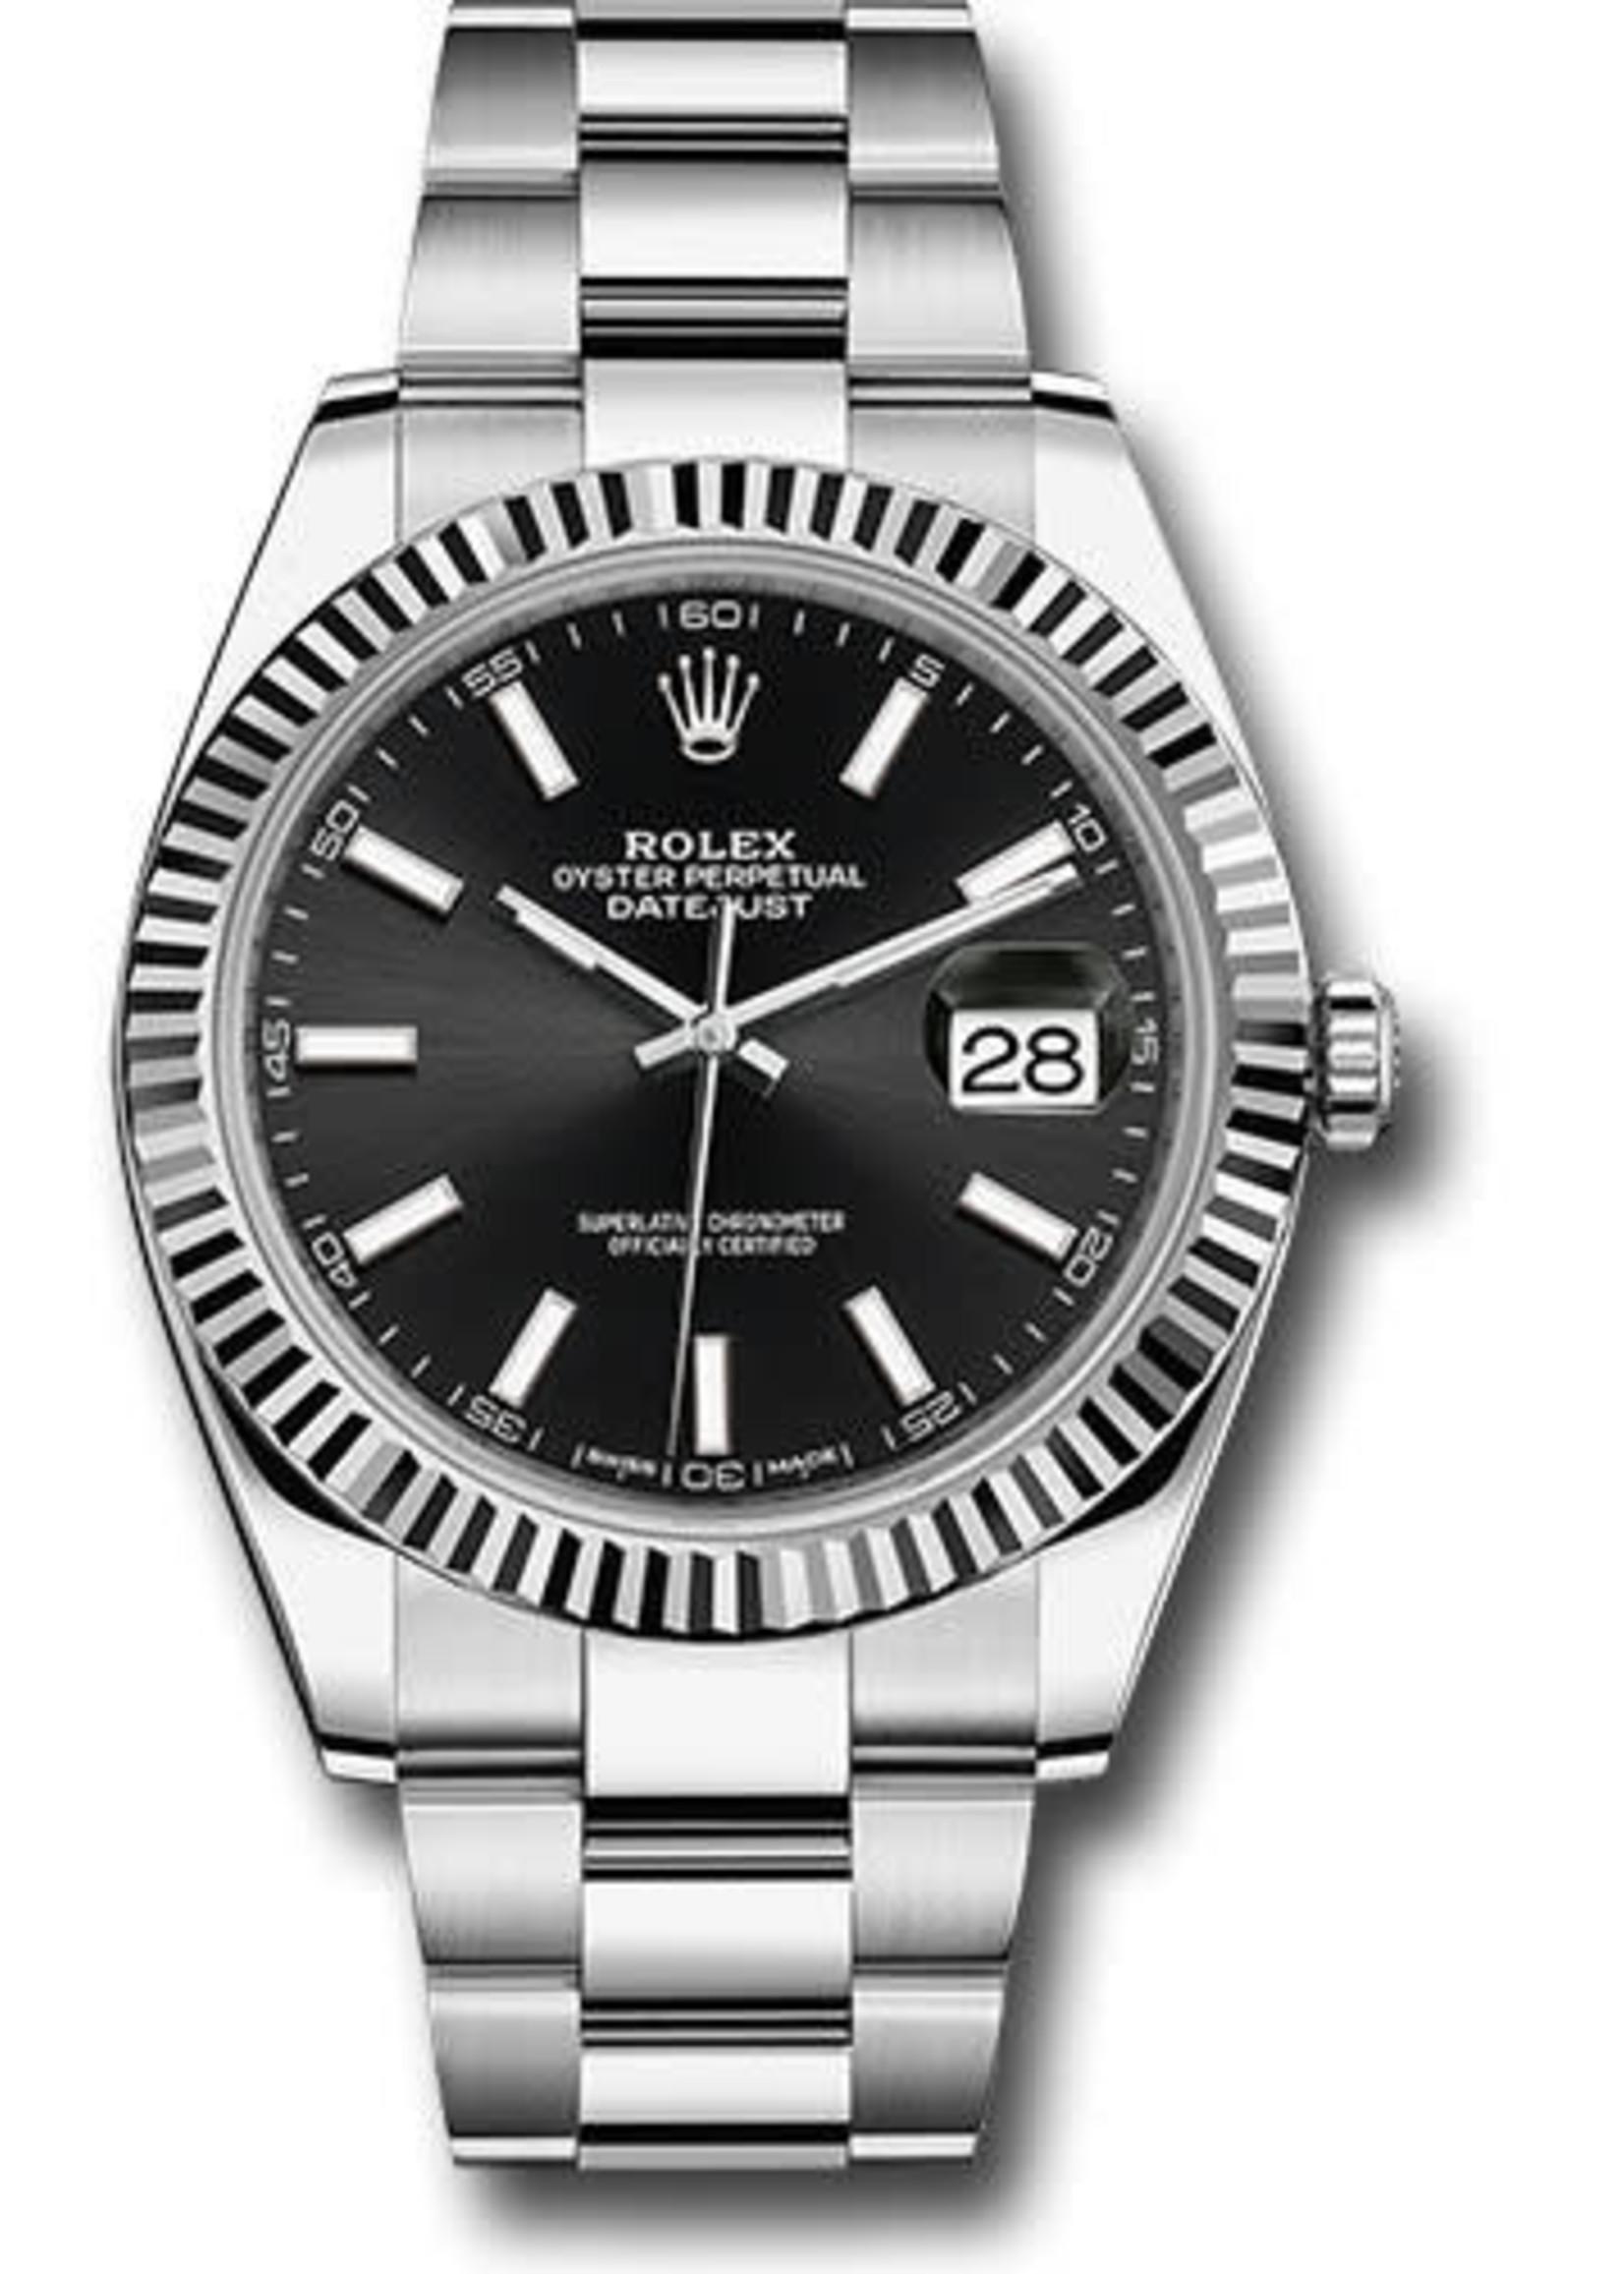 Rolex ROLEX DATEJUST II 41MM (2010 B+P) #116334